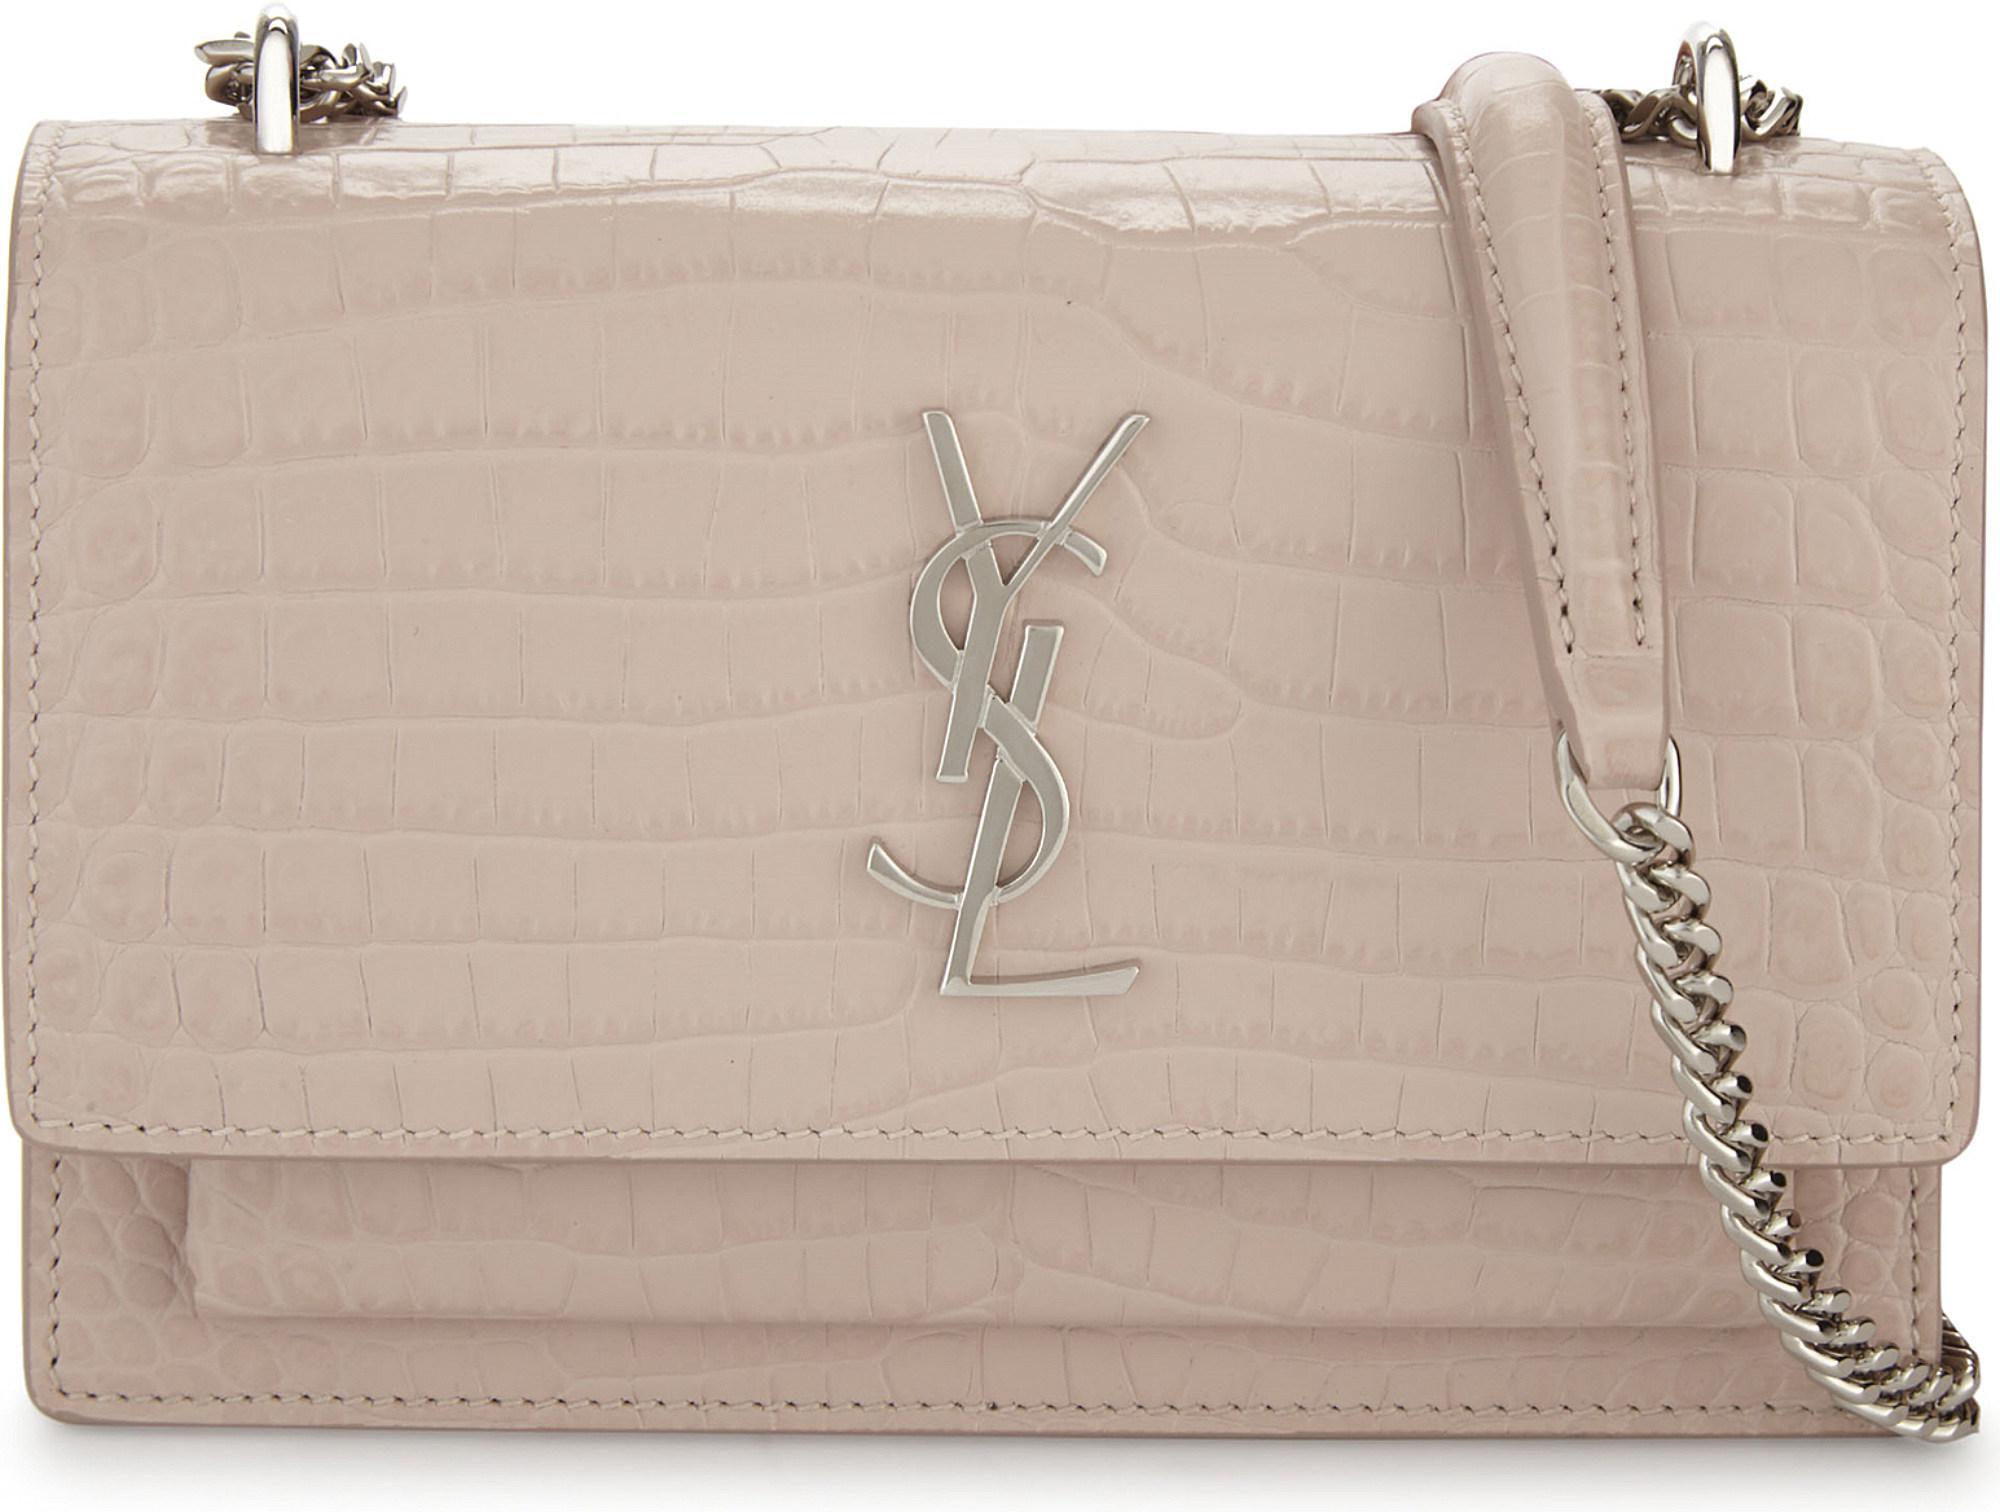 995c5f62e0a Saint Laurent Sunset Croc-embossed Leather Cross-body Bag - Lyst